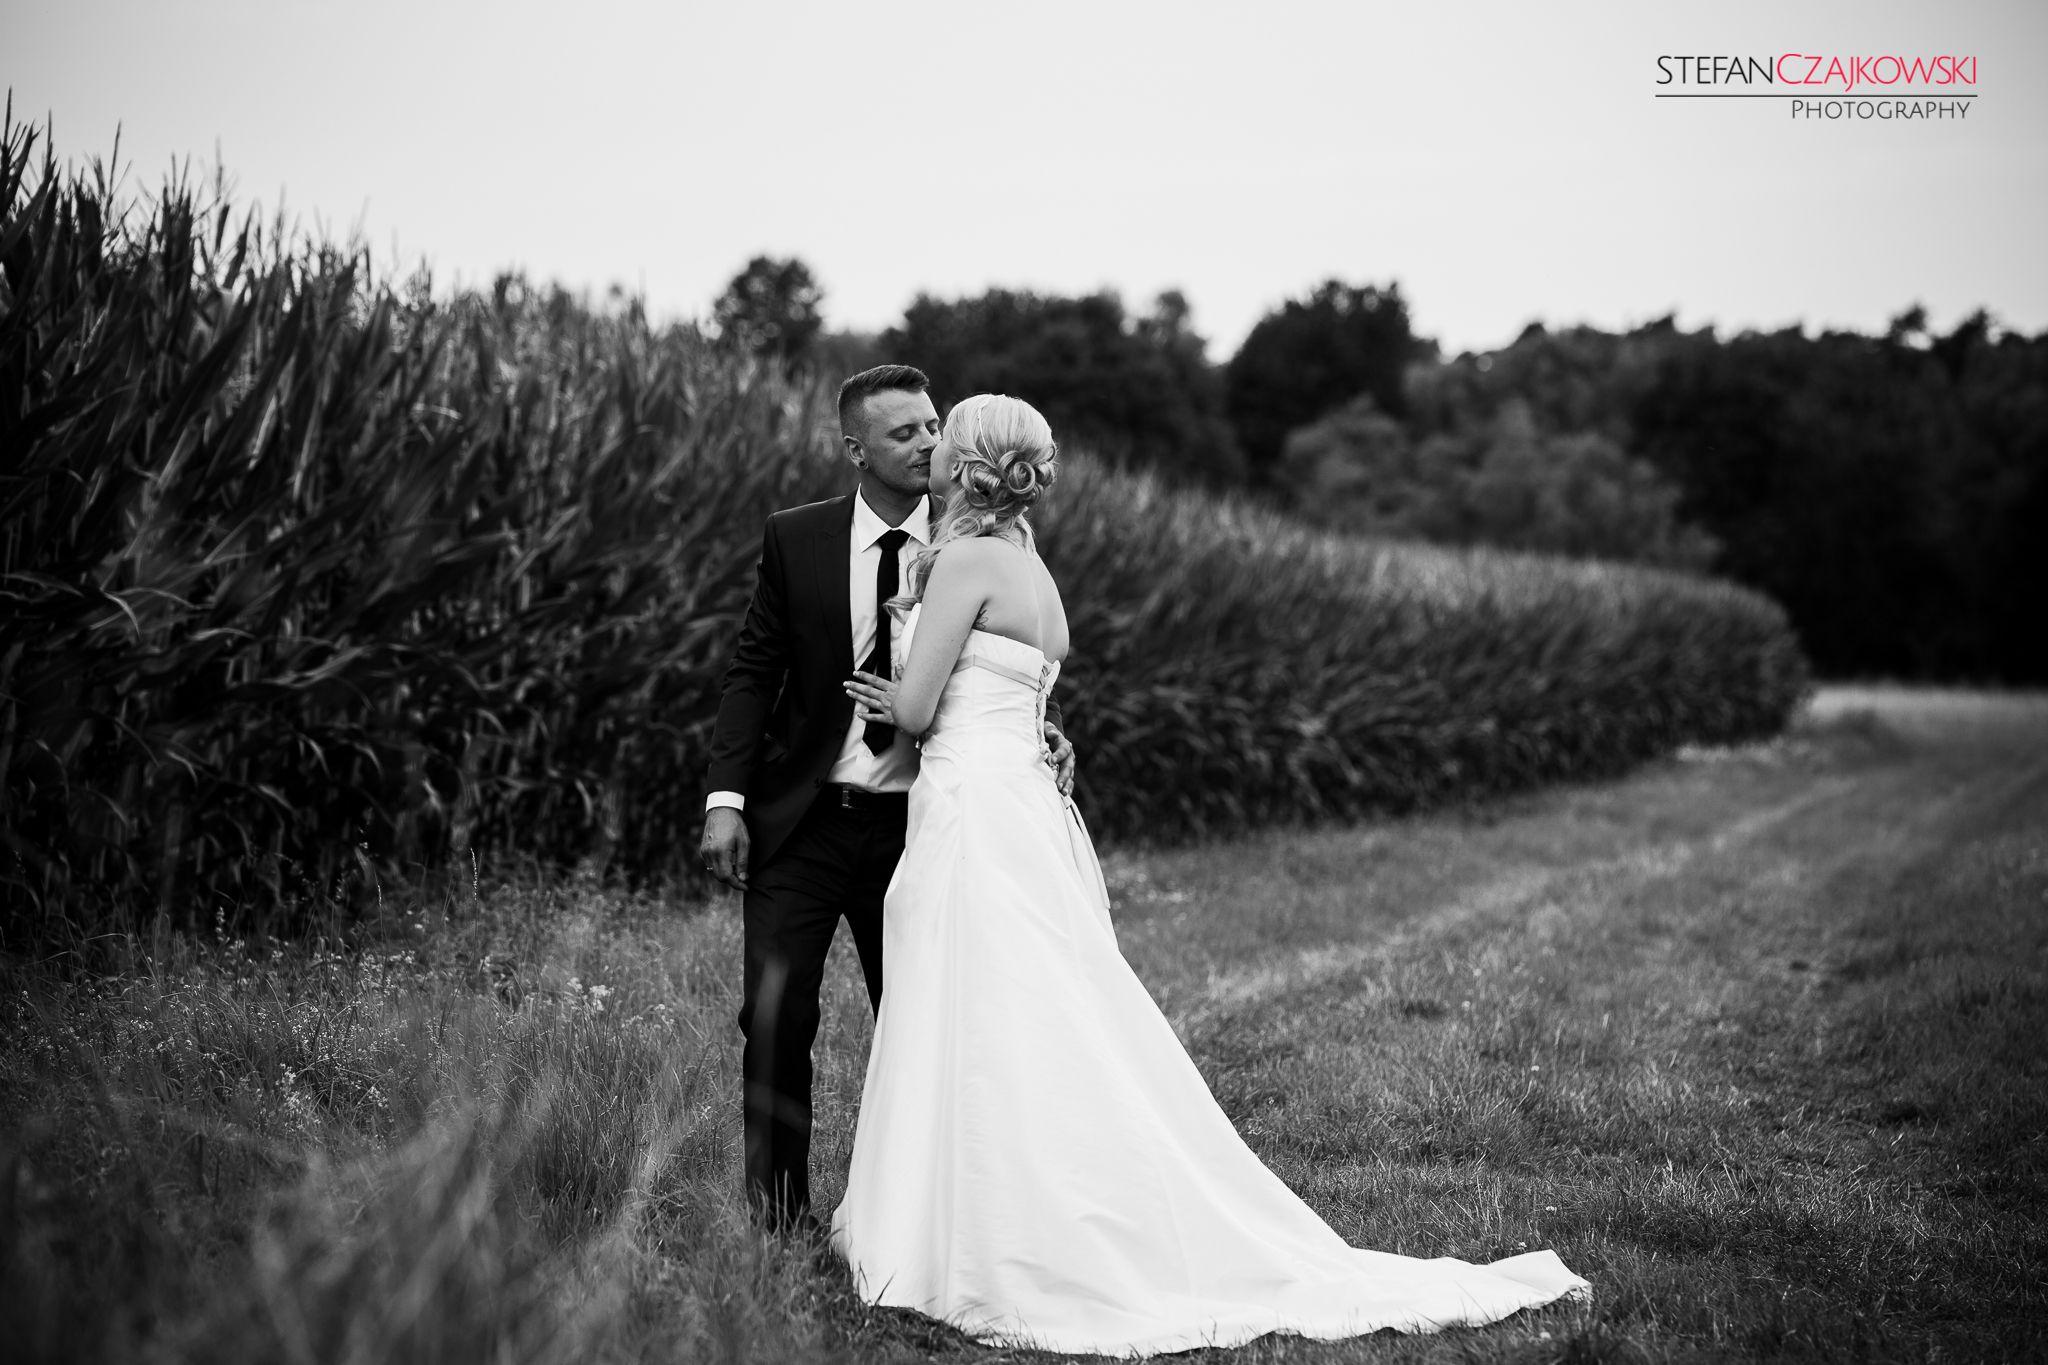 Stefan Czajkowski Photography Wedding Photography